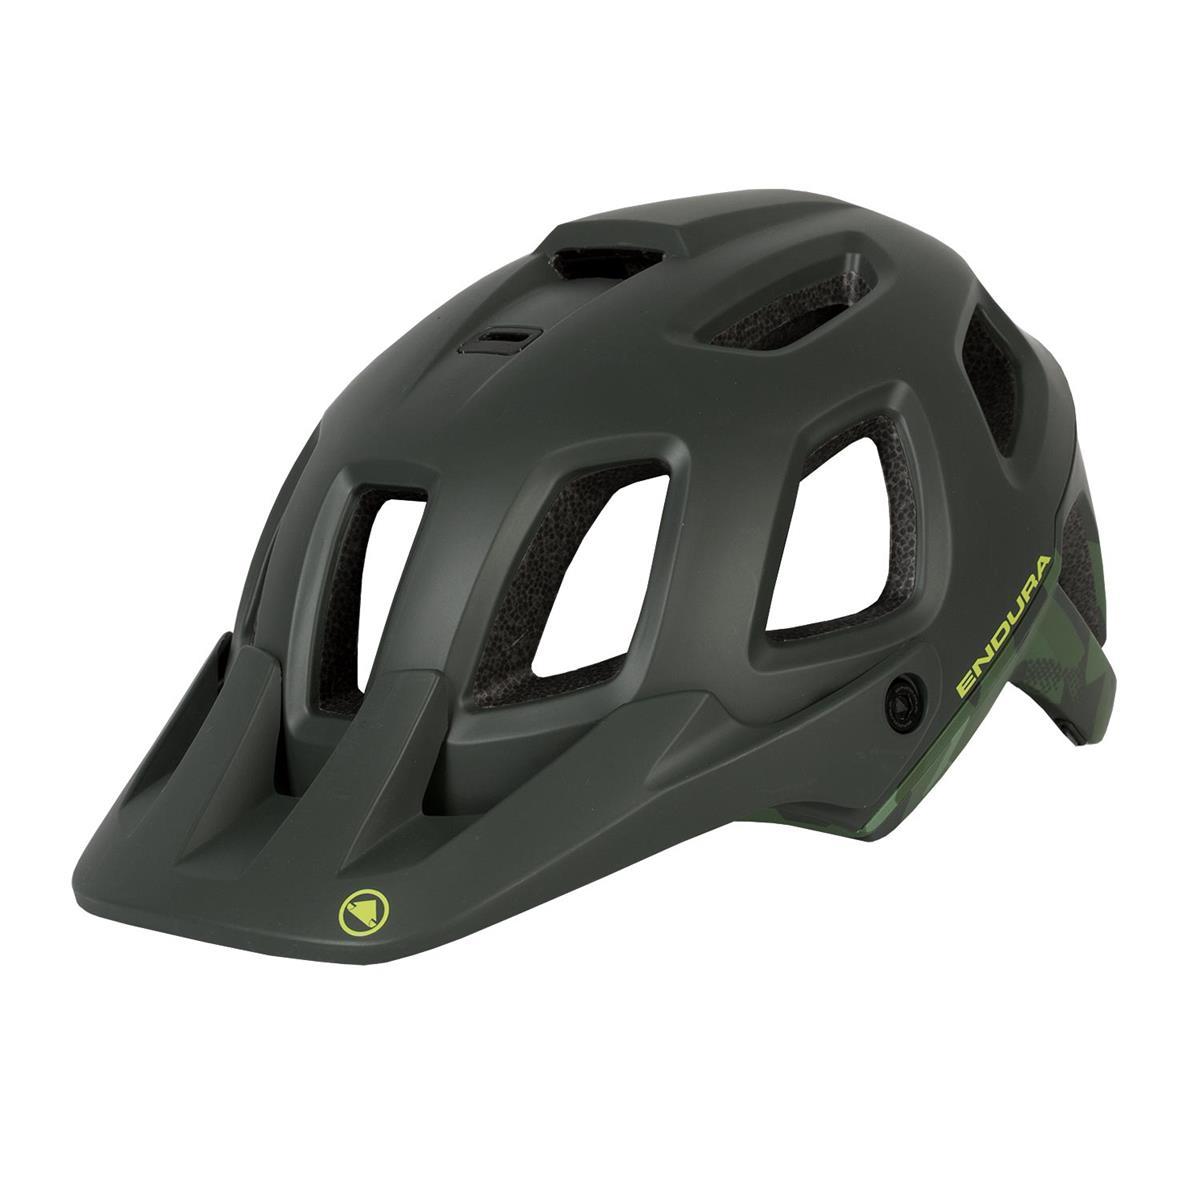 helmet SingleTrack Helmet II green size L/XL (58-63cm)